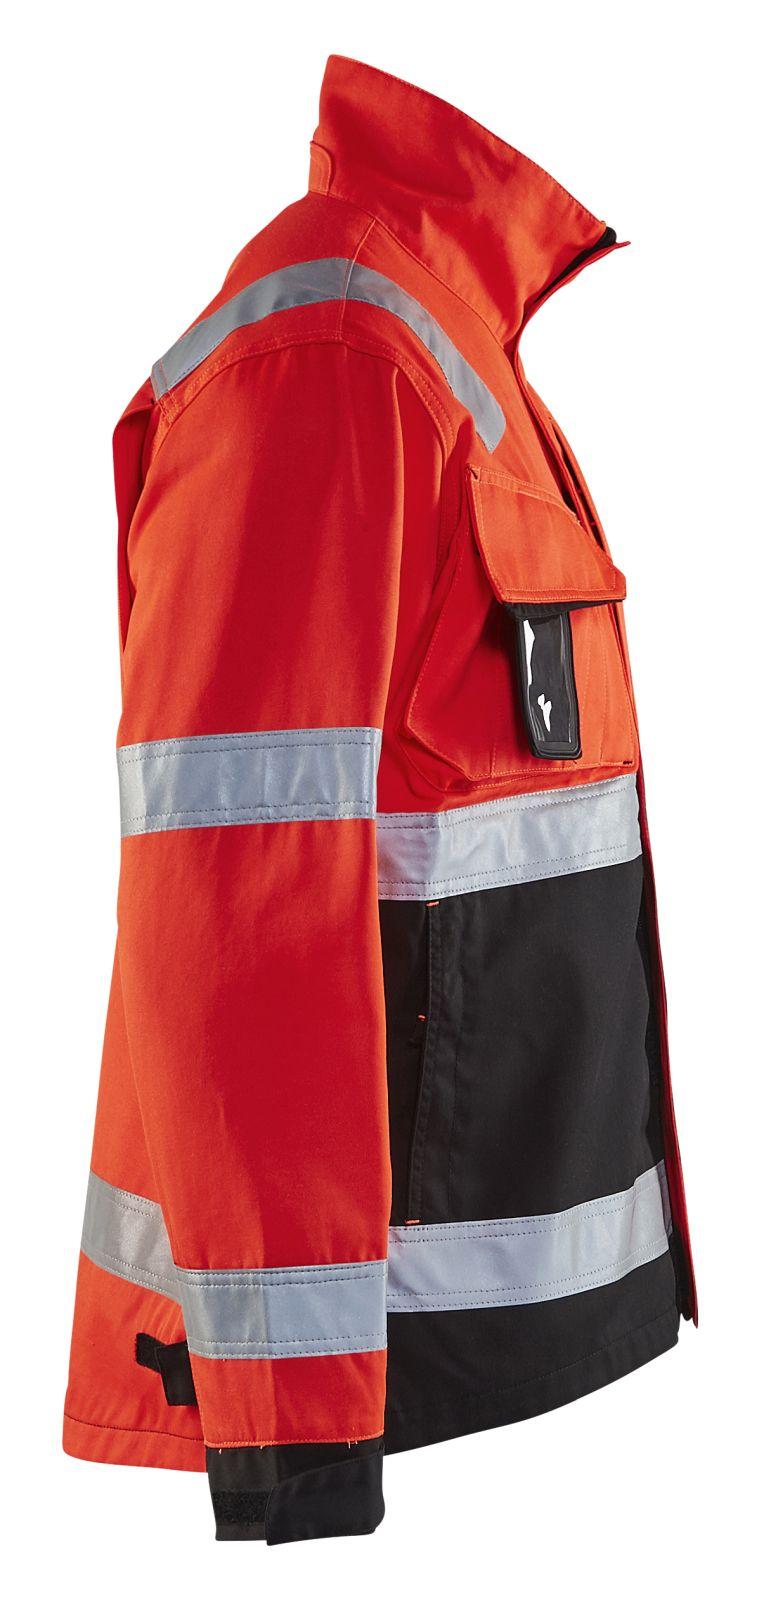 Blaklader Combi-jacks 40641811 High Vis fluor rood-zwart(5599)